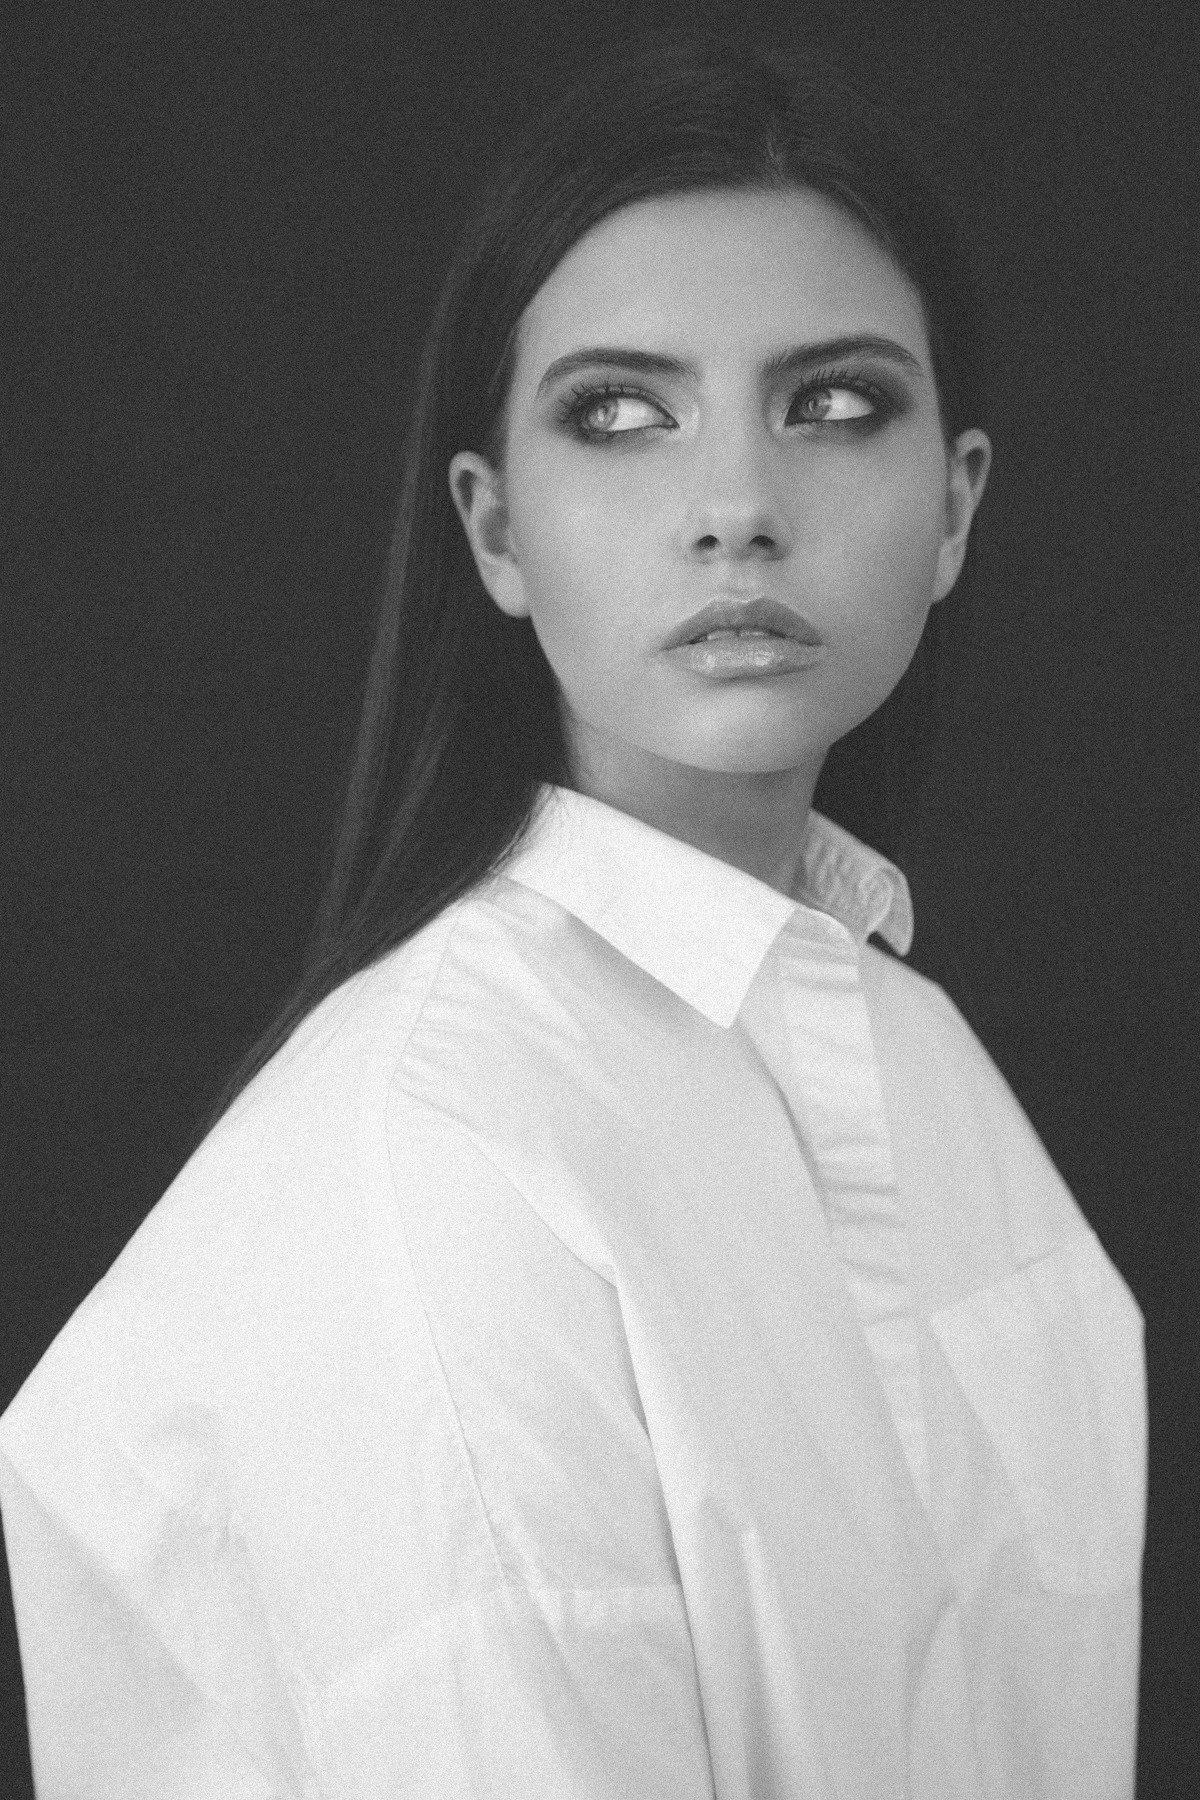 portrait girl model bw портрет девушка модель, Dancho